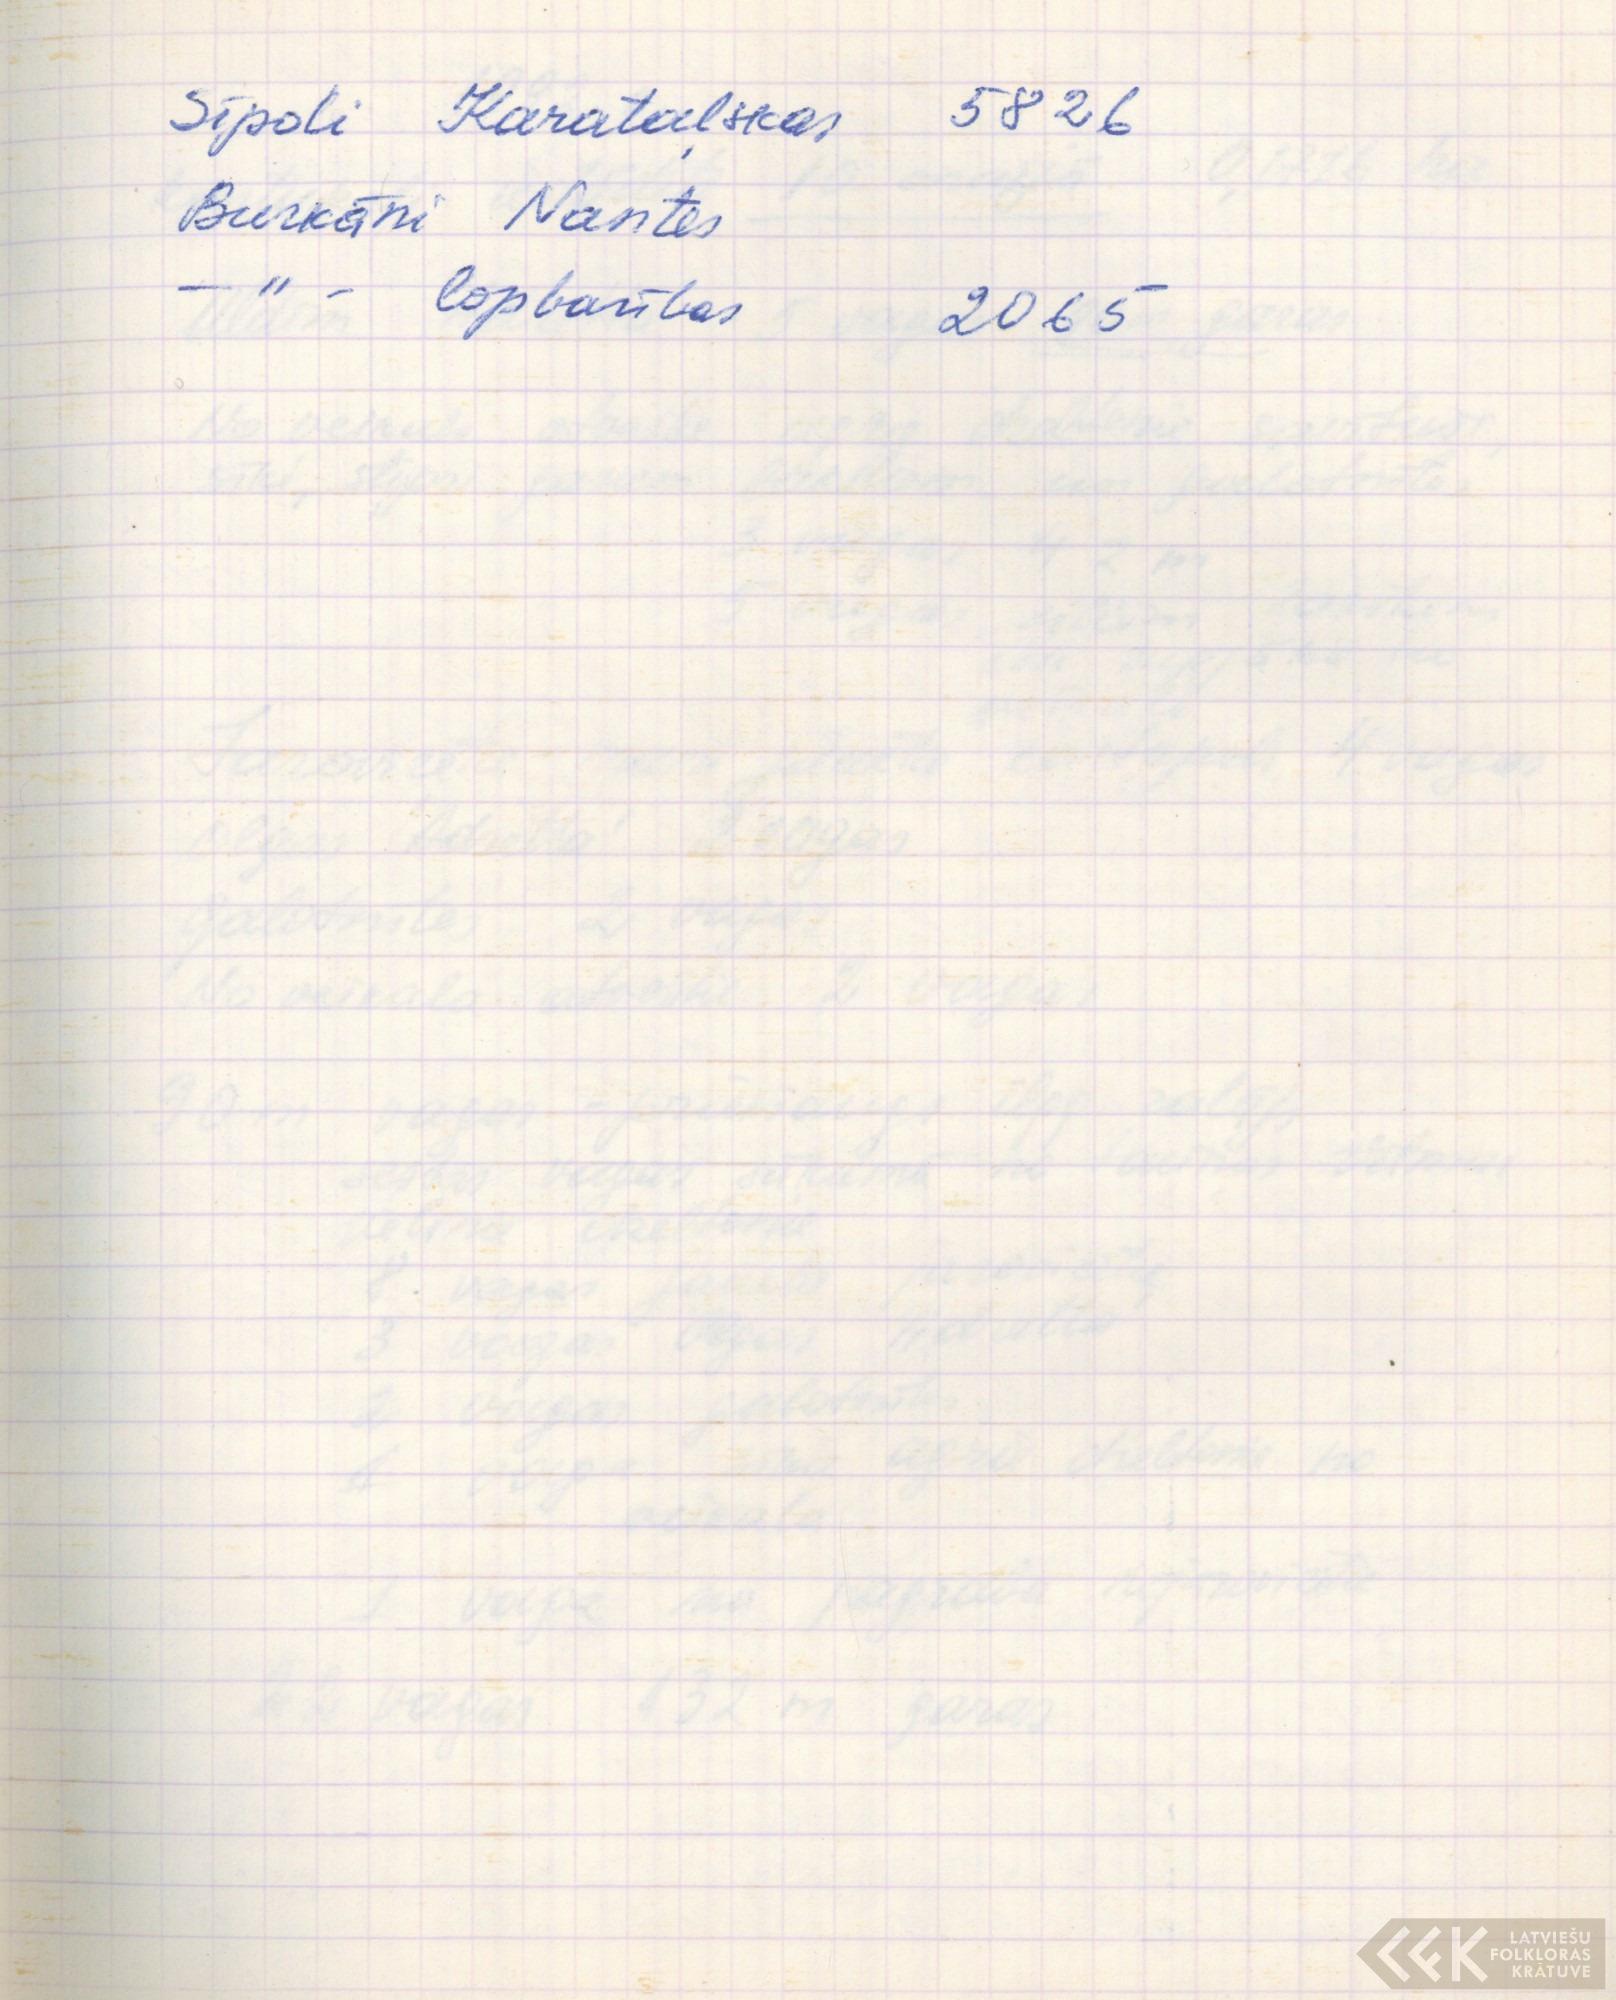 Ak161-Ligitas-Vucenas-dienasgramatas-33-0029